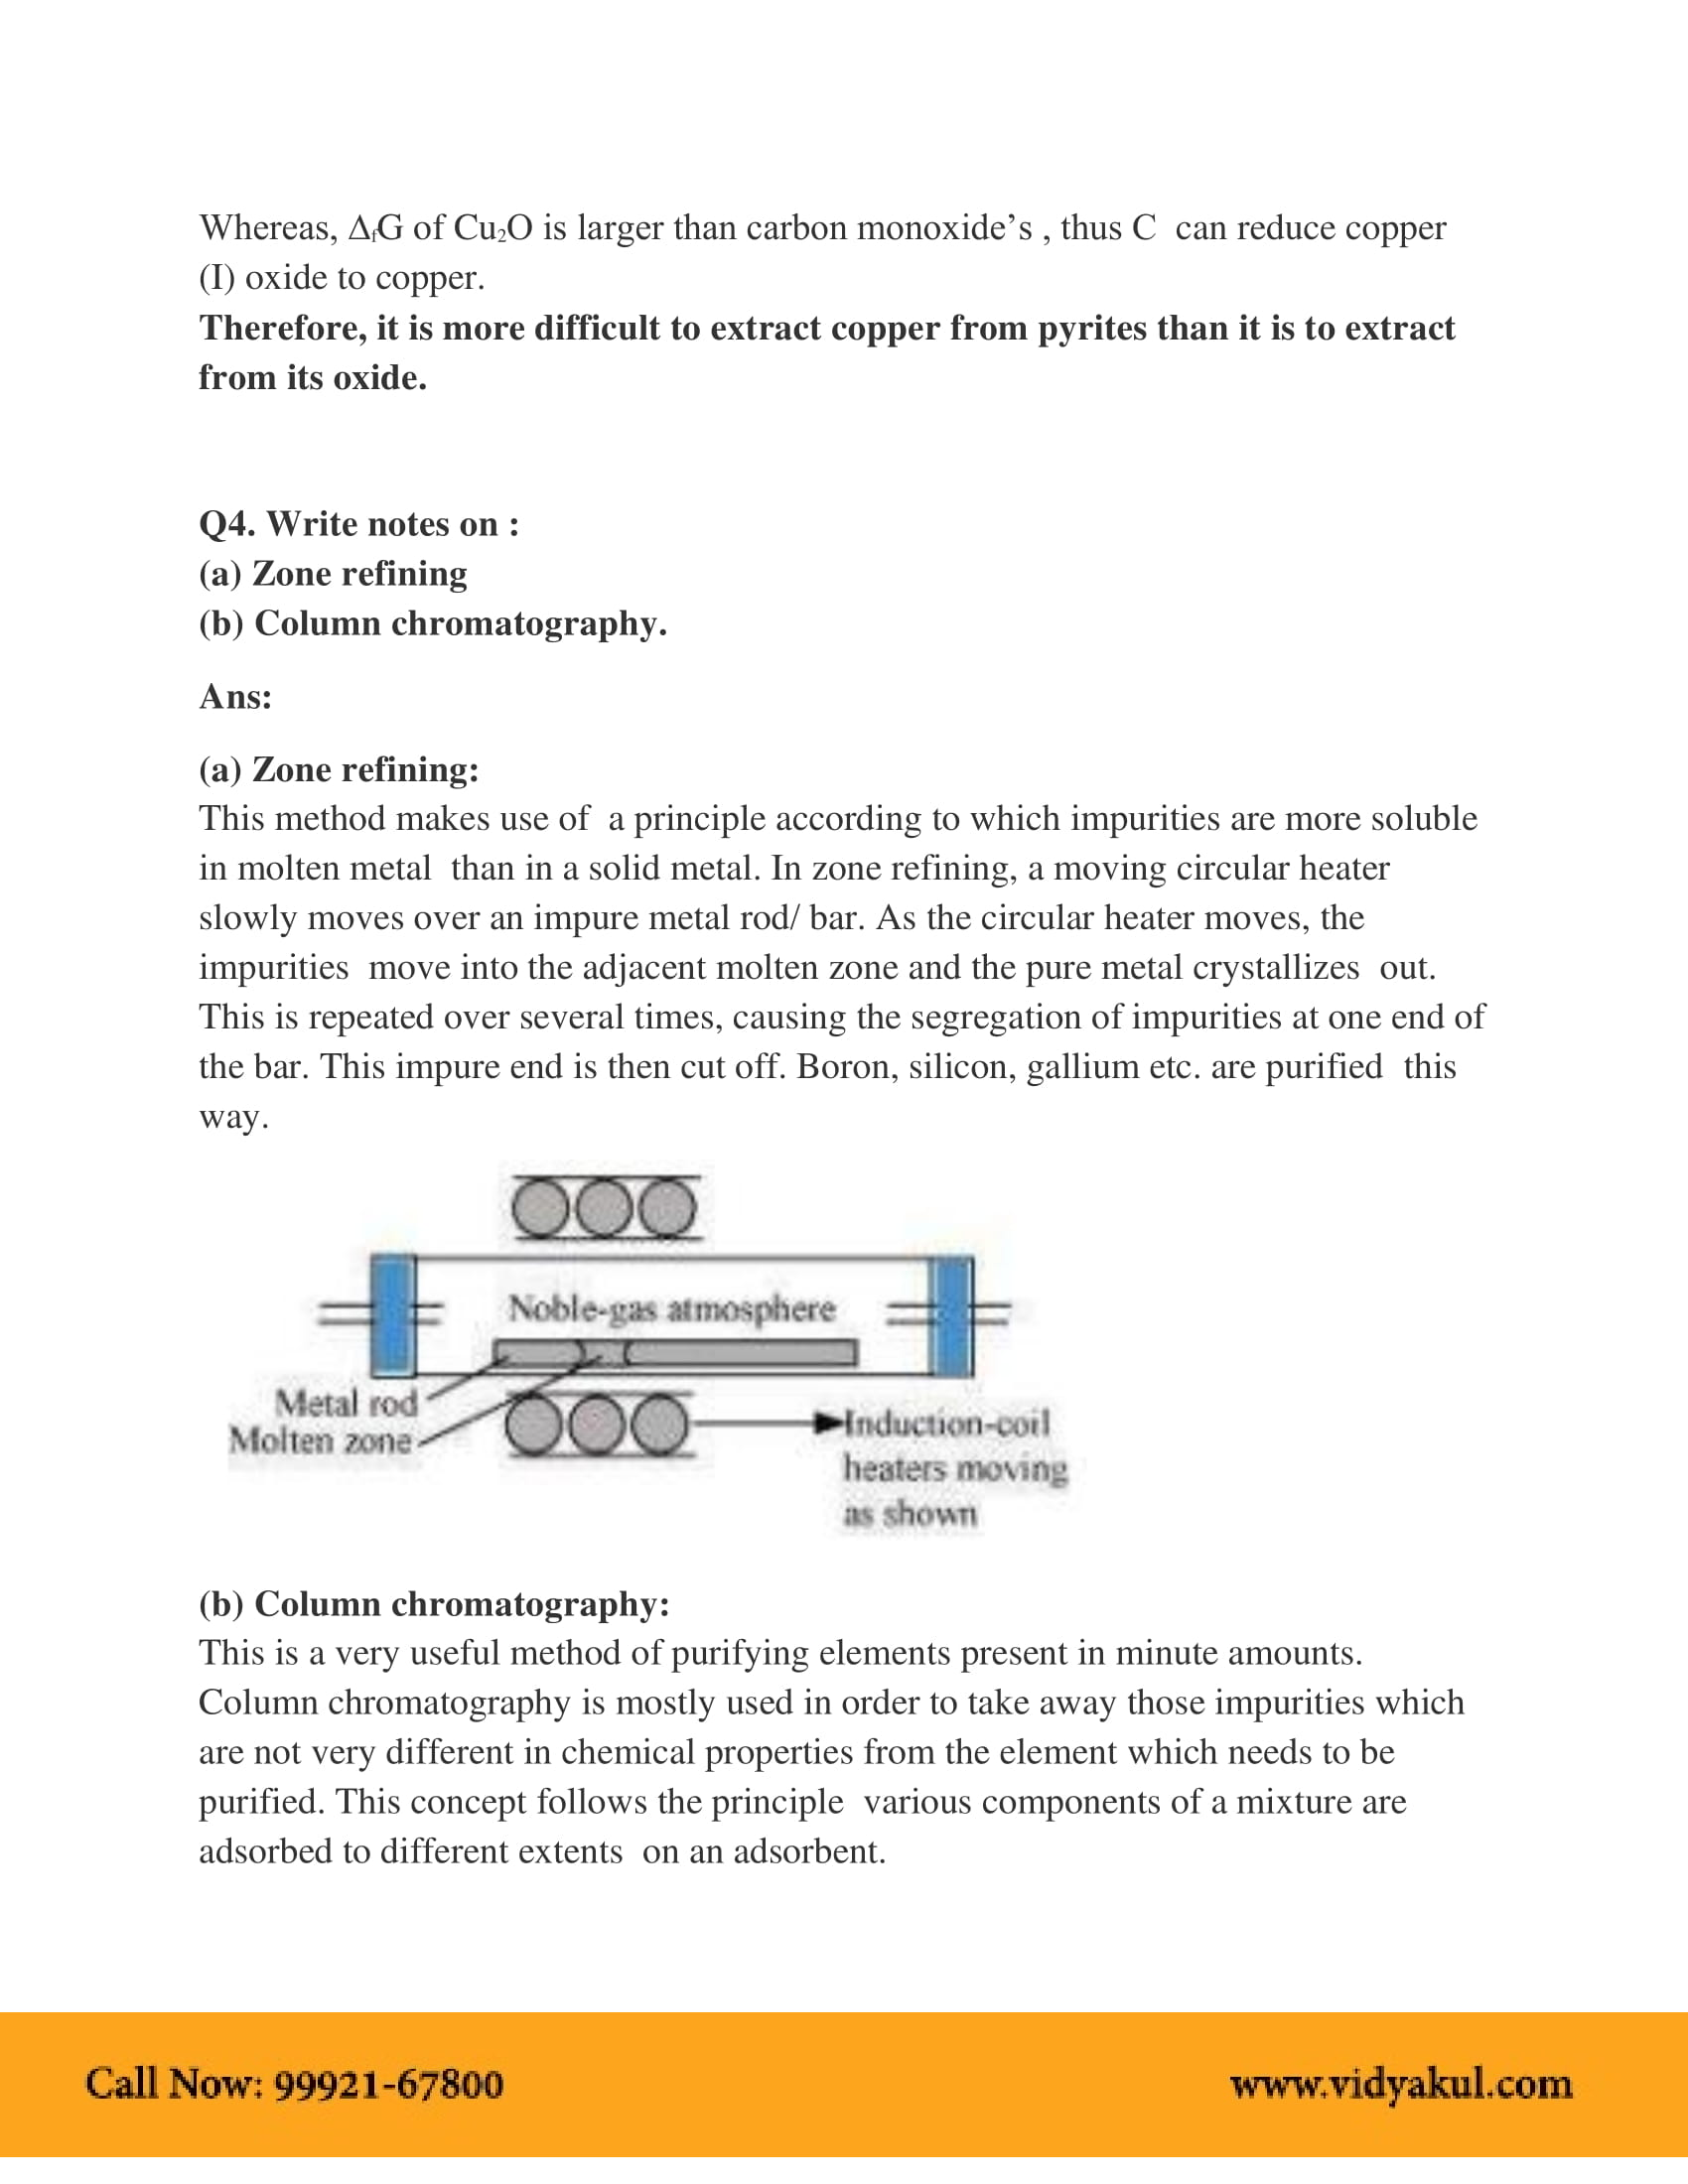 NCERT Solution Class 12 Chemistry Chapter 6 | Vidyakul